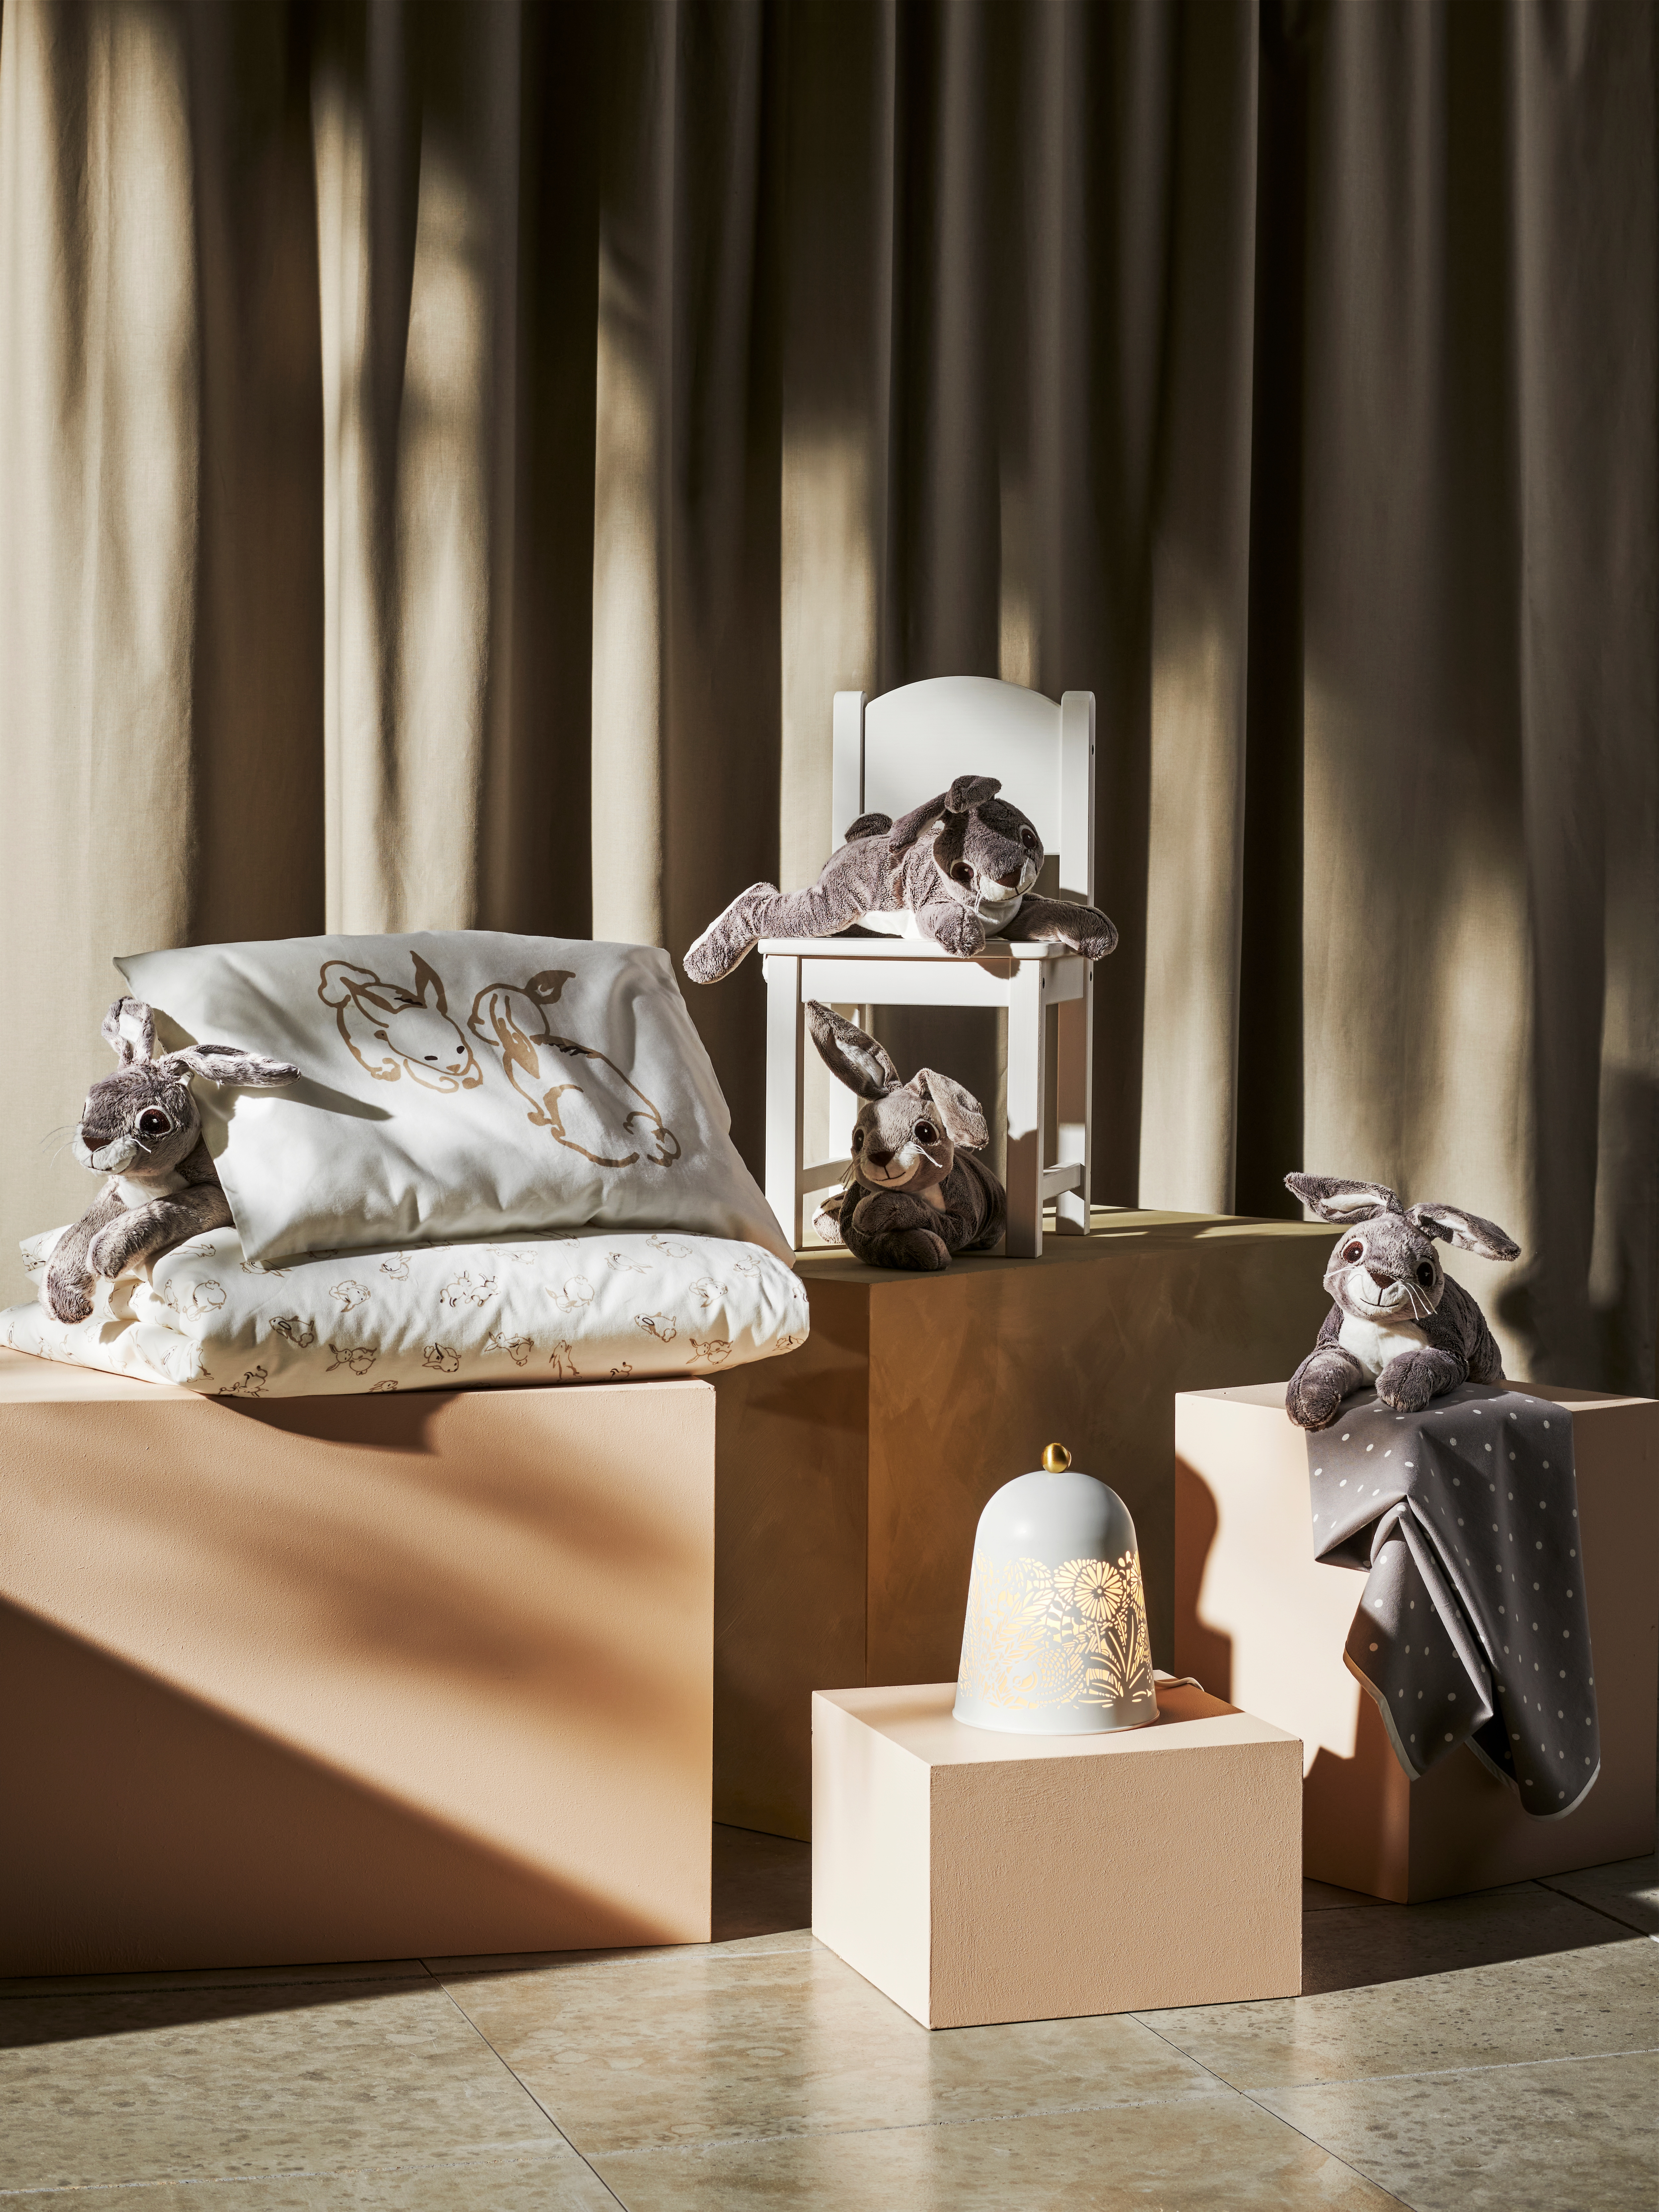 RÖDHAKE komplet posteljine, plišani zec, stolna lampa i podloga za bebe na postoljima, u pozadini su zavjese.